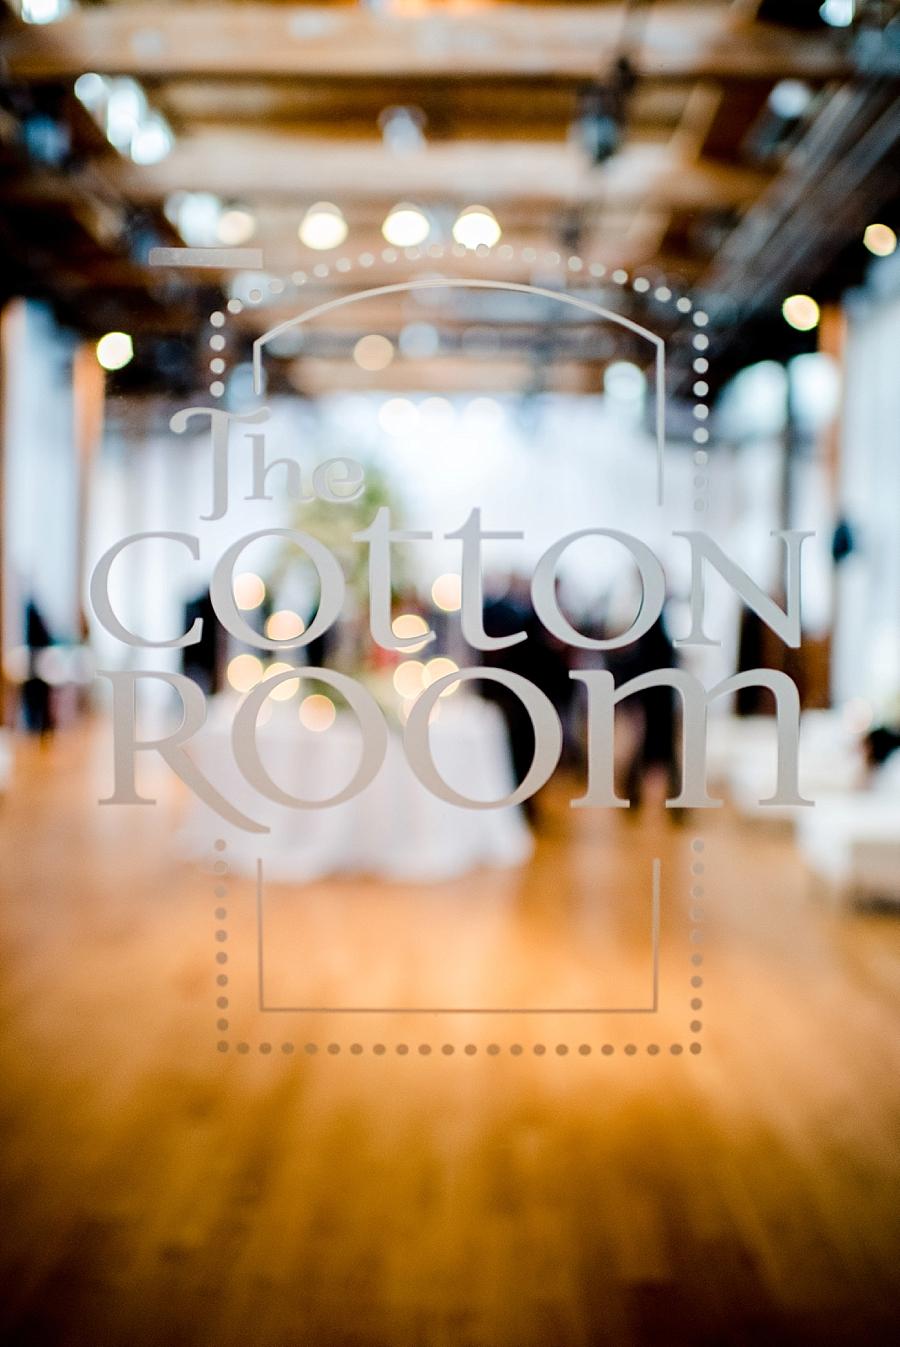 cottonroomwedddingphotographer_0069.jpg